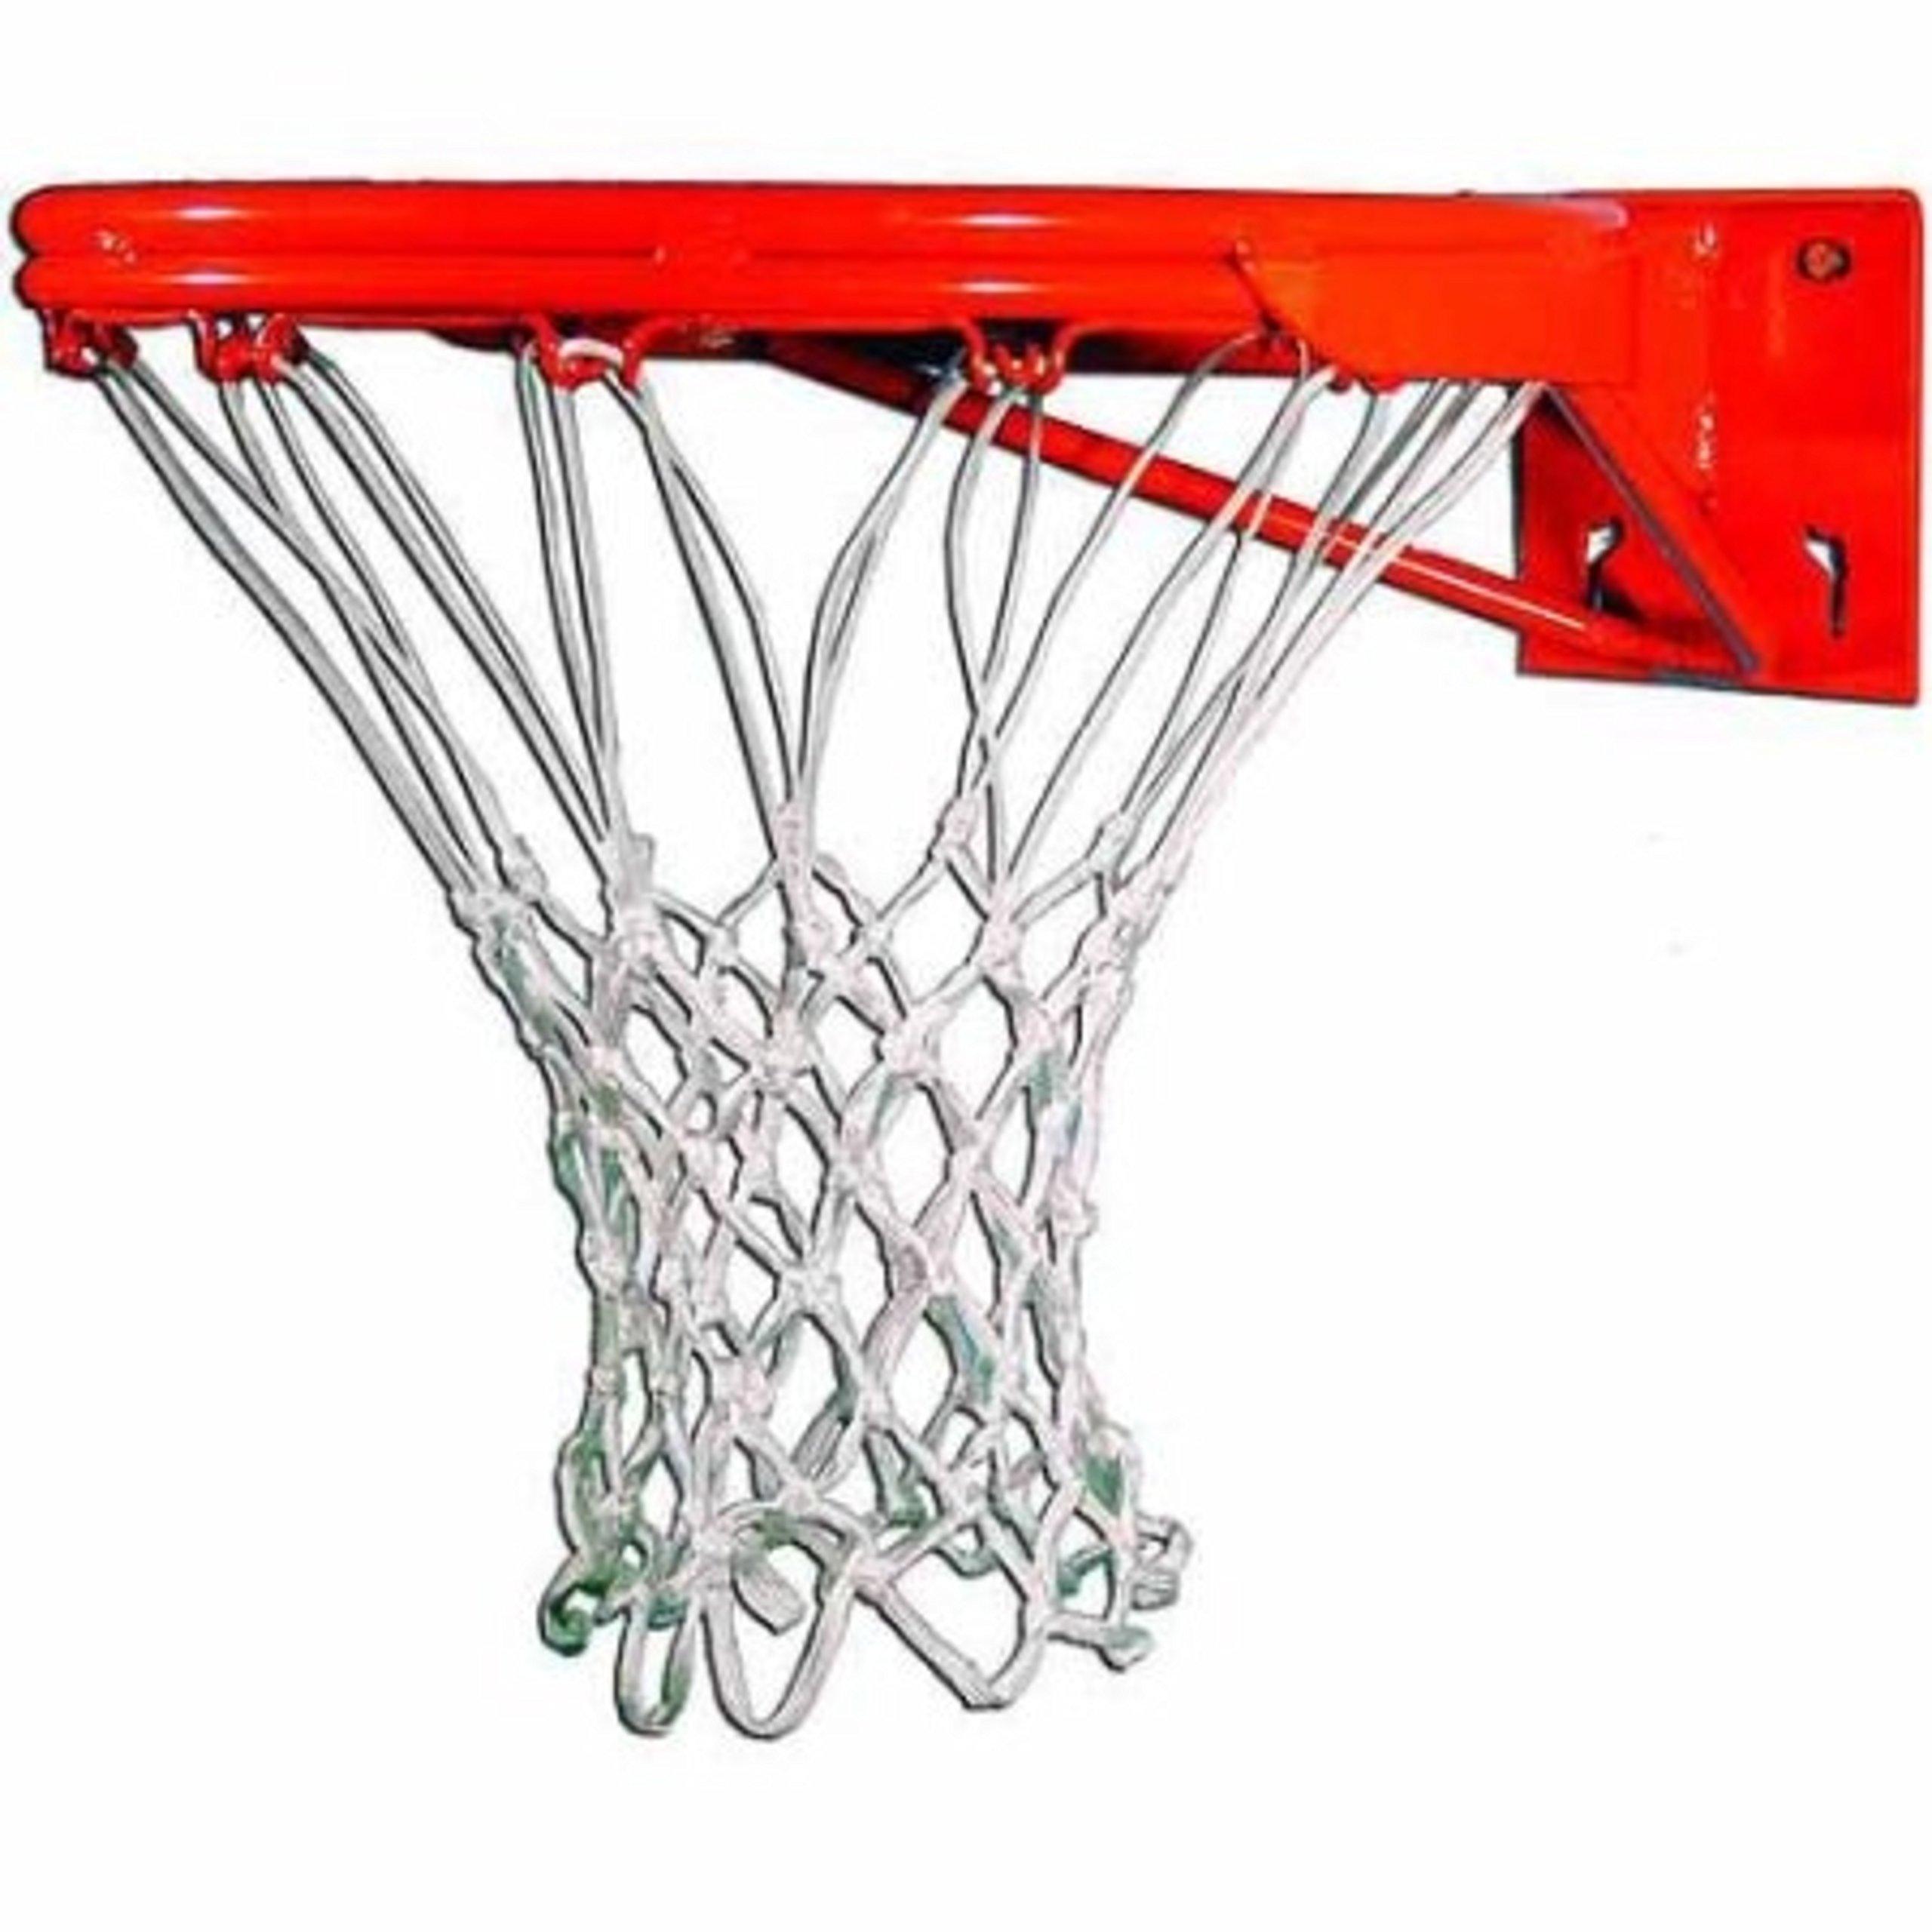 Heavy Duty Official Size Double Steel Basketball Rim